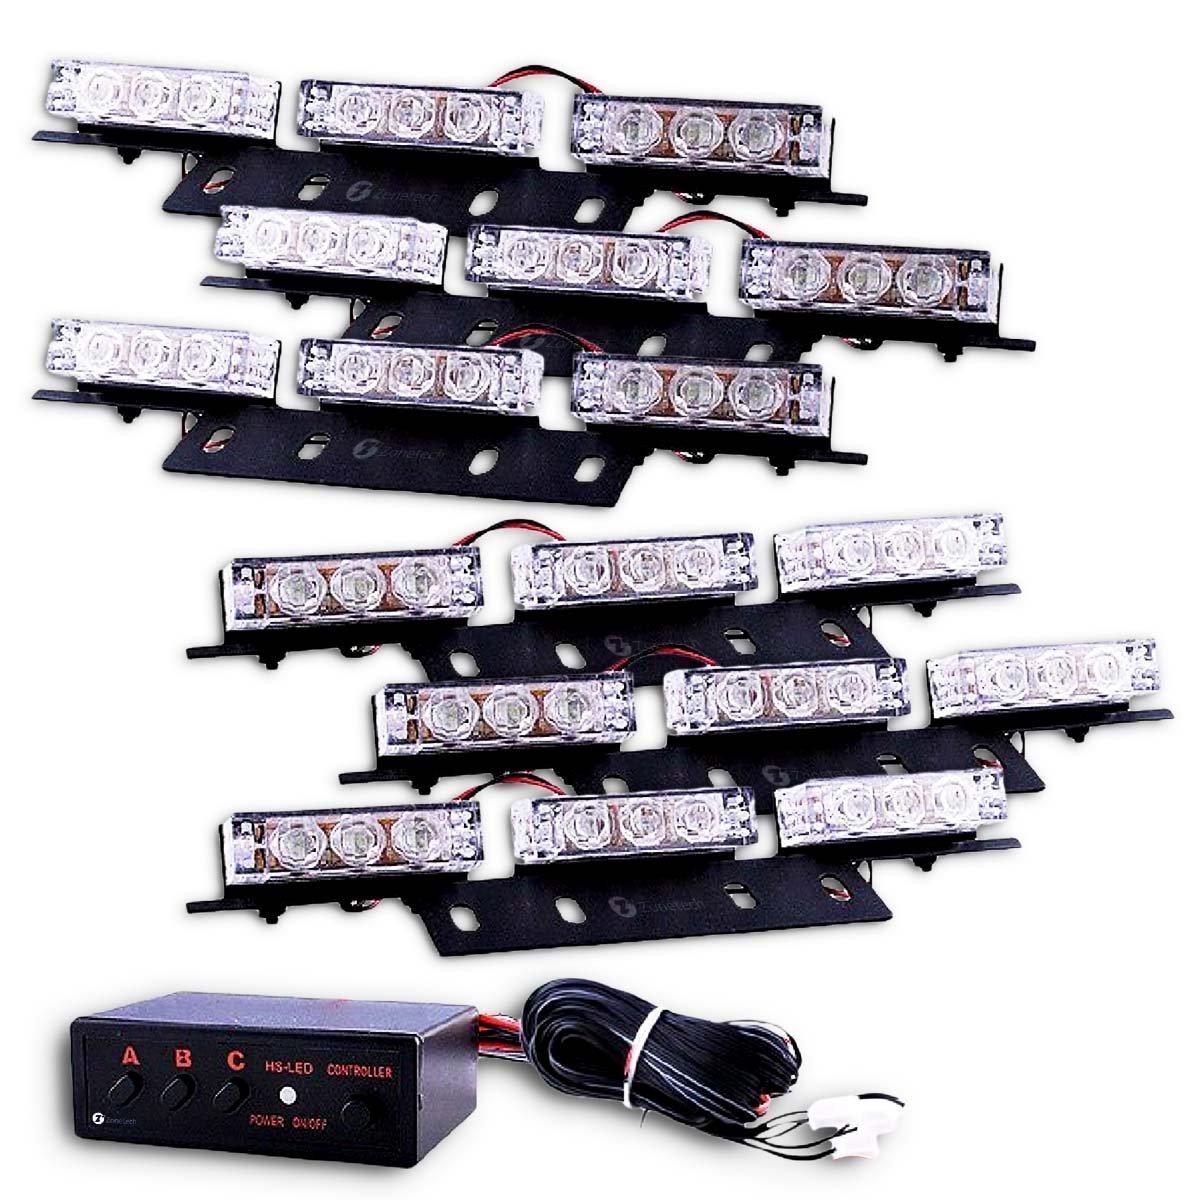 Zone Tech Blue Red 54X LED Police Vehicle Deck Grille Strobe Warning Lights - 1 set Comfort Wheels es0008-